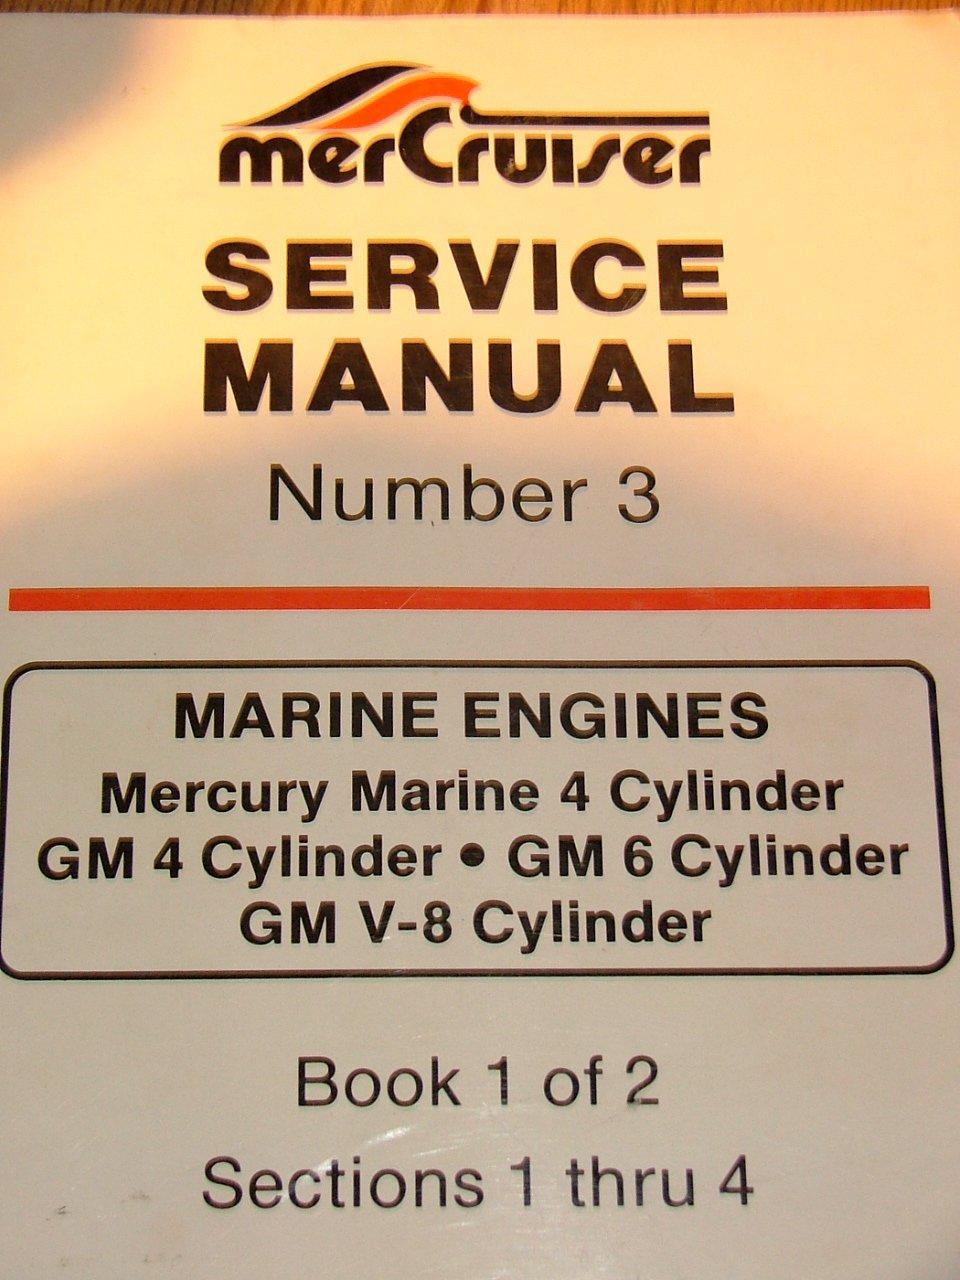 MerCruiser Service Manual Number 3: MARINE ENGINES Mercury Marine 4  Cylinder; GM 4 Cylinder; GM 6 Cylinder; GM V-8 Cylinder. Book 1 of 2;  Sections 1 thru 4: ...